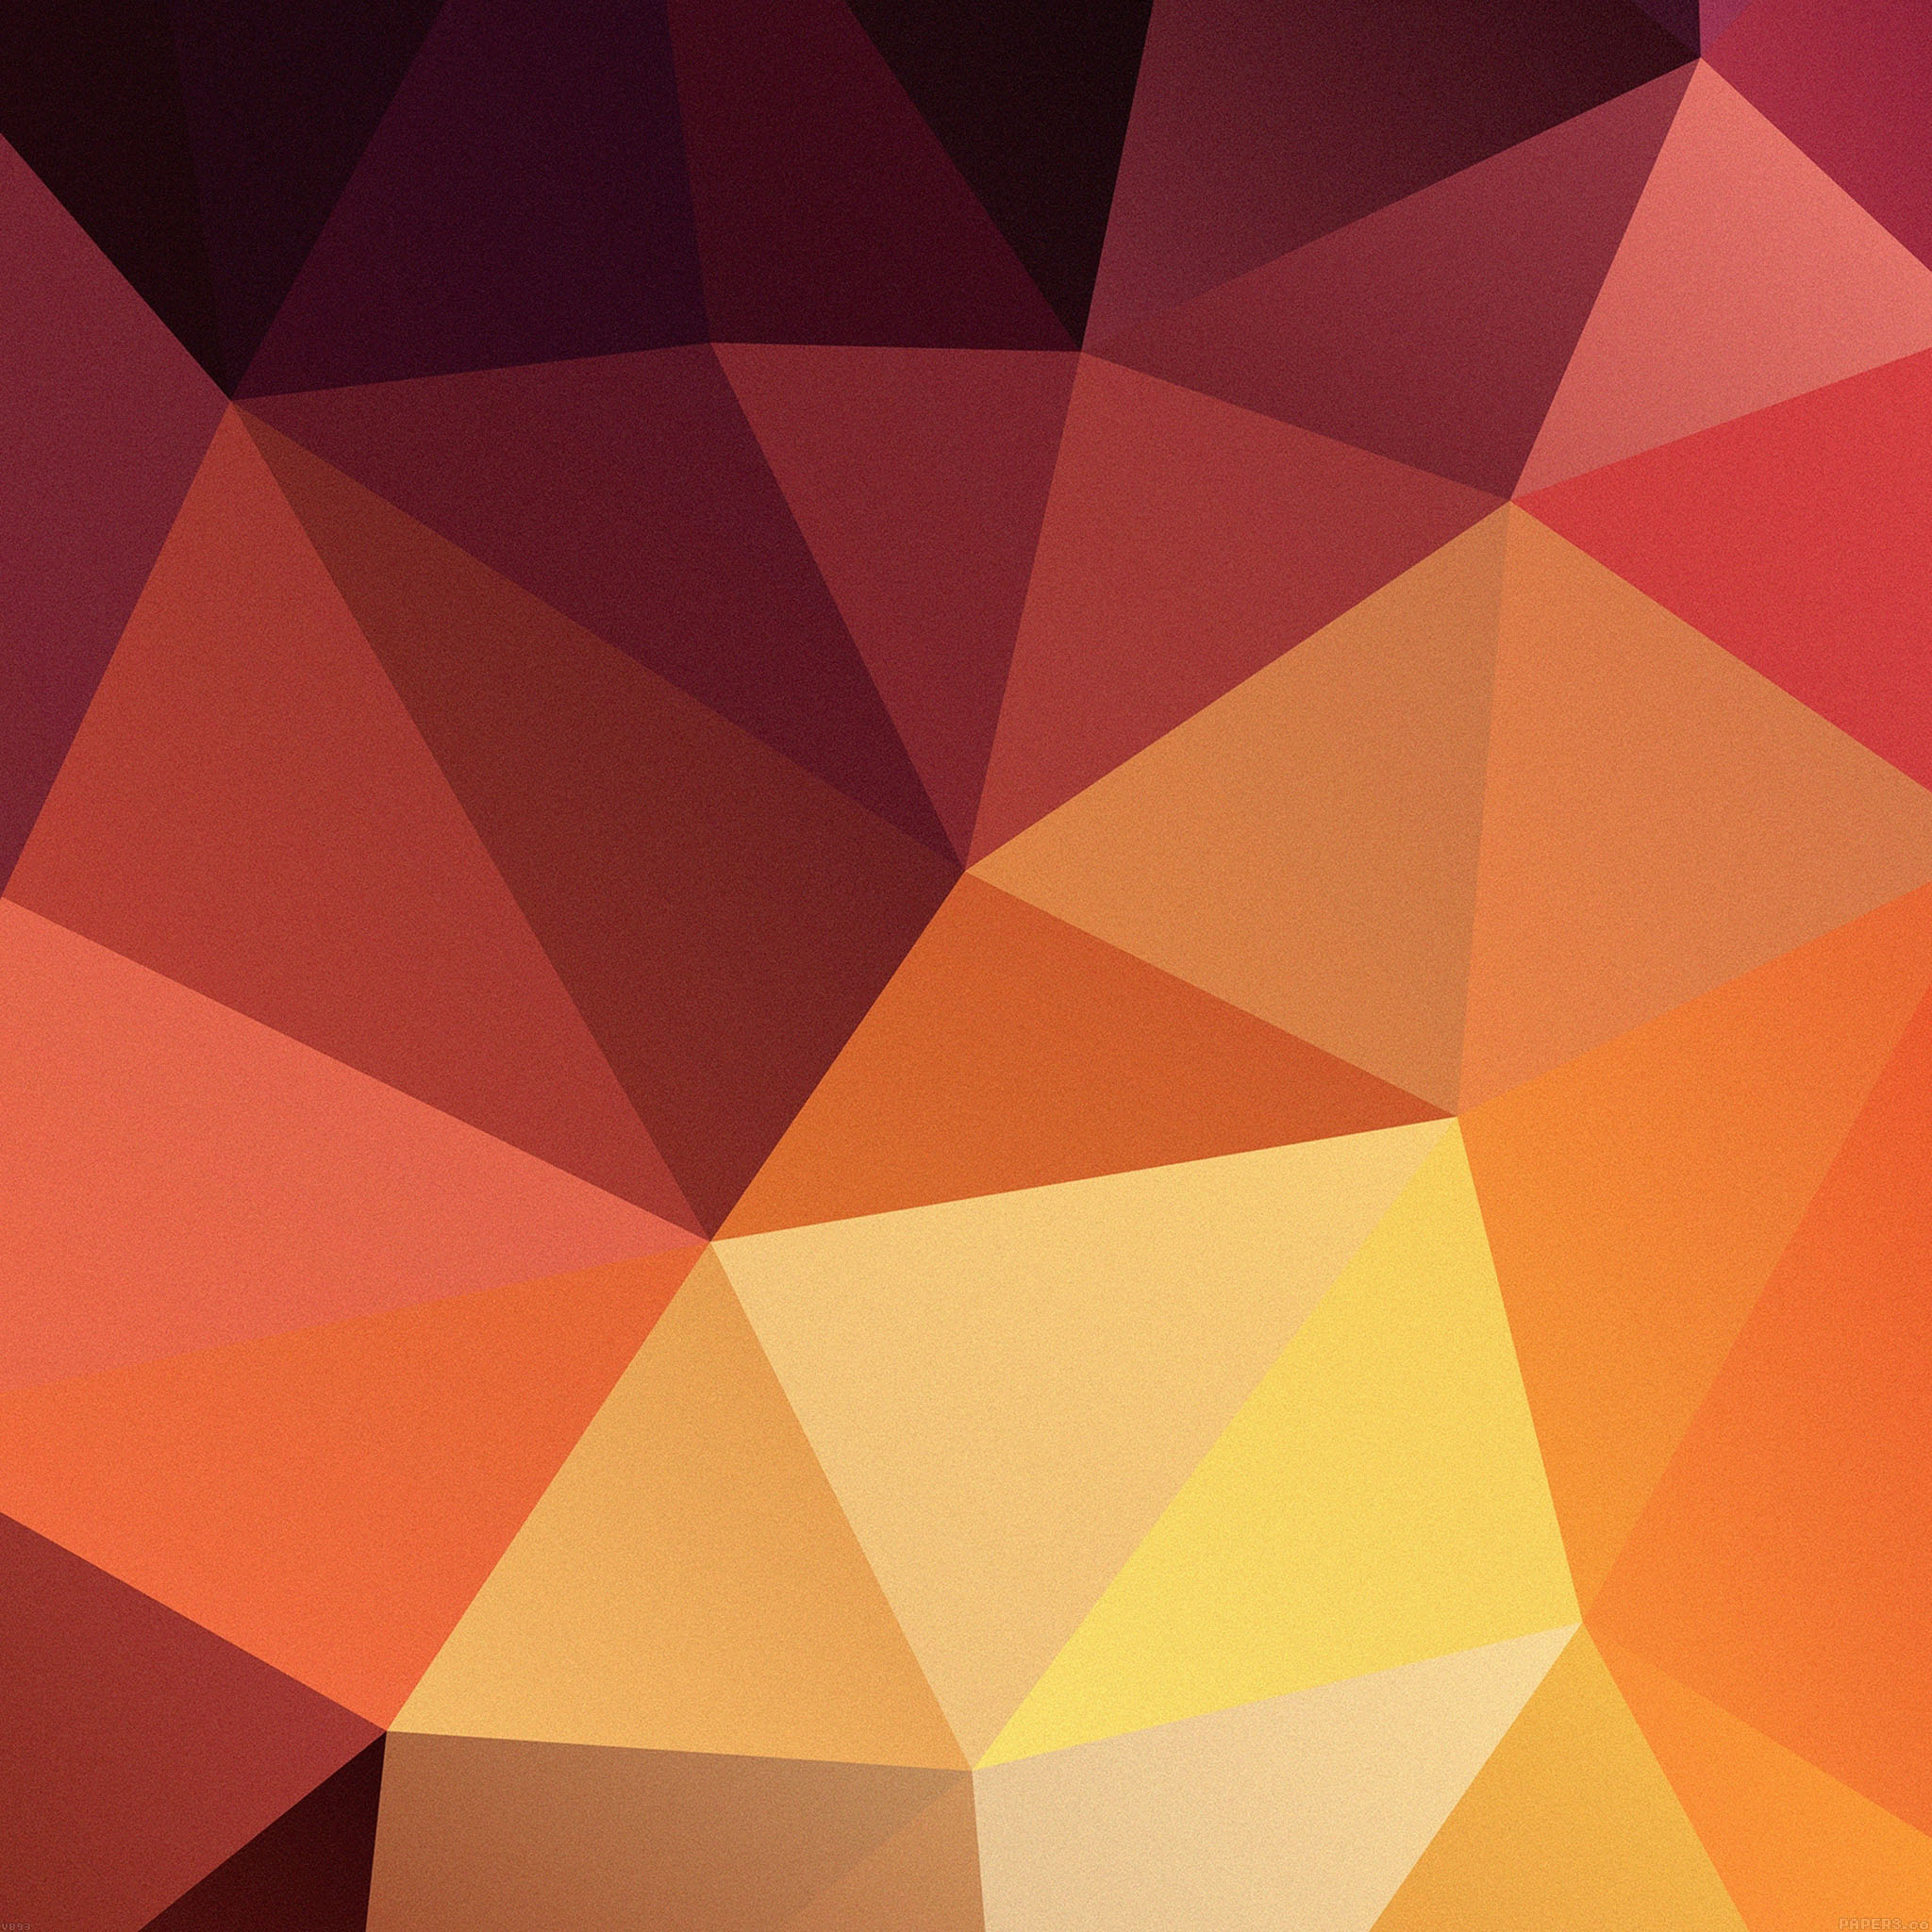 Iphone 6 Orange Flower Wallpaper Wallpapers